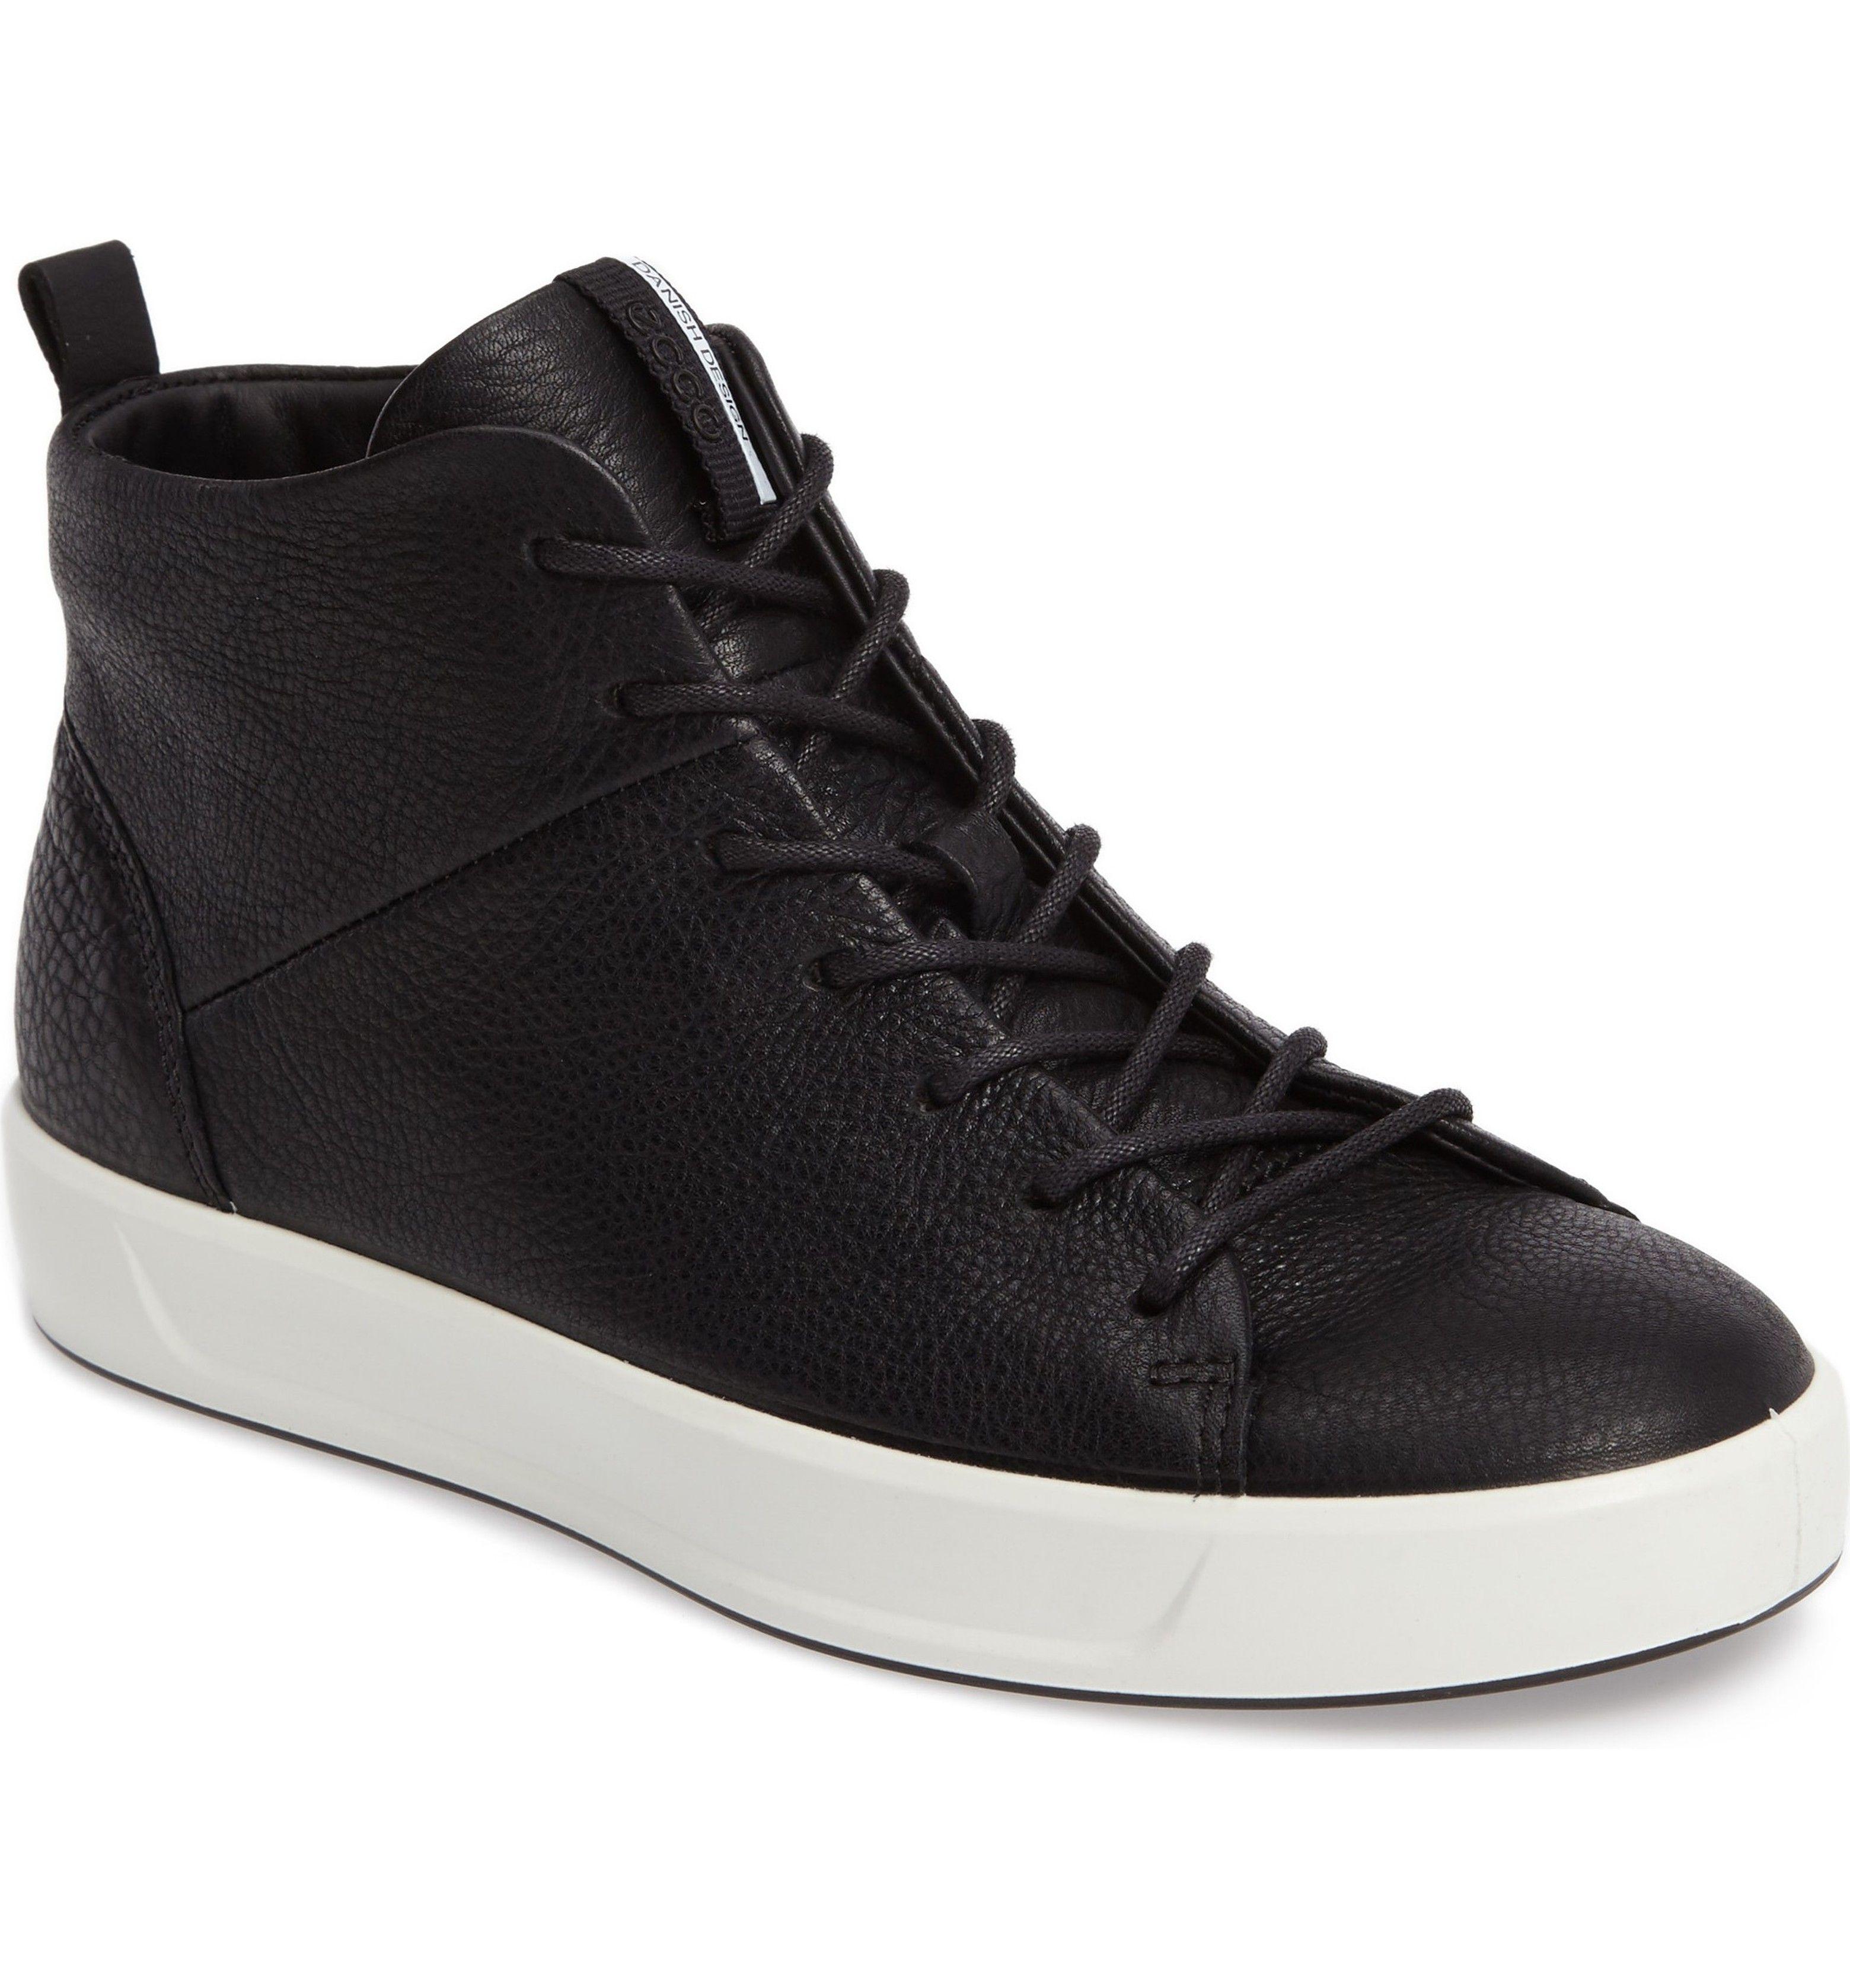 ECCO Soft 8 High Top Sneaker (Women